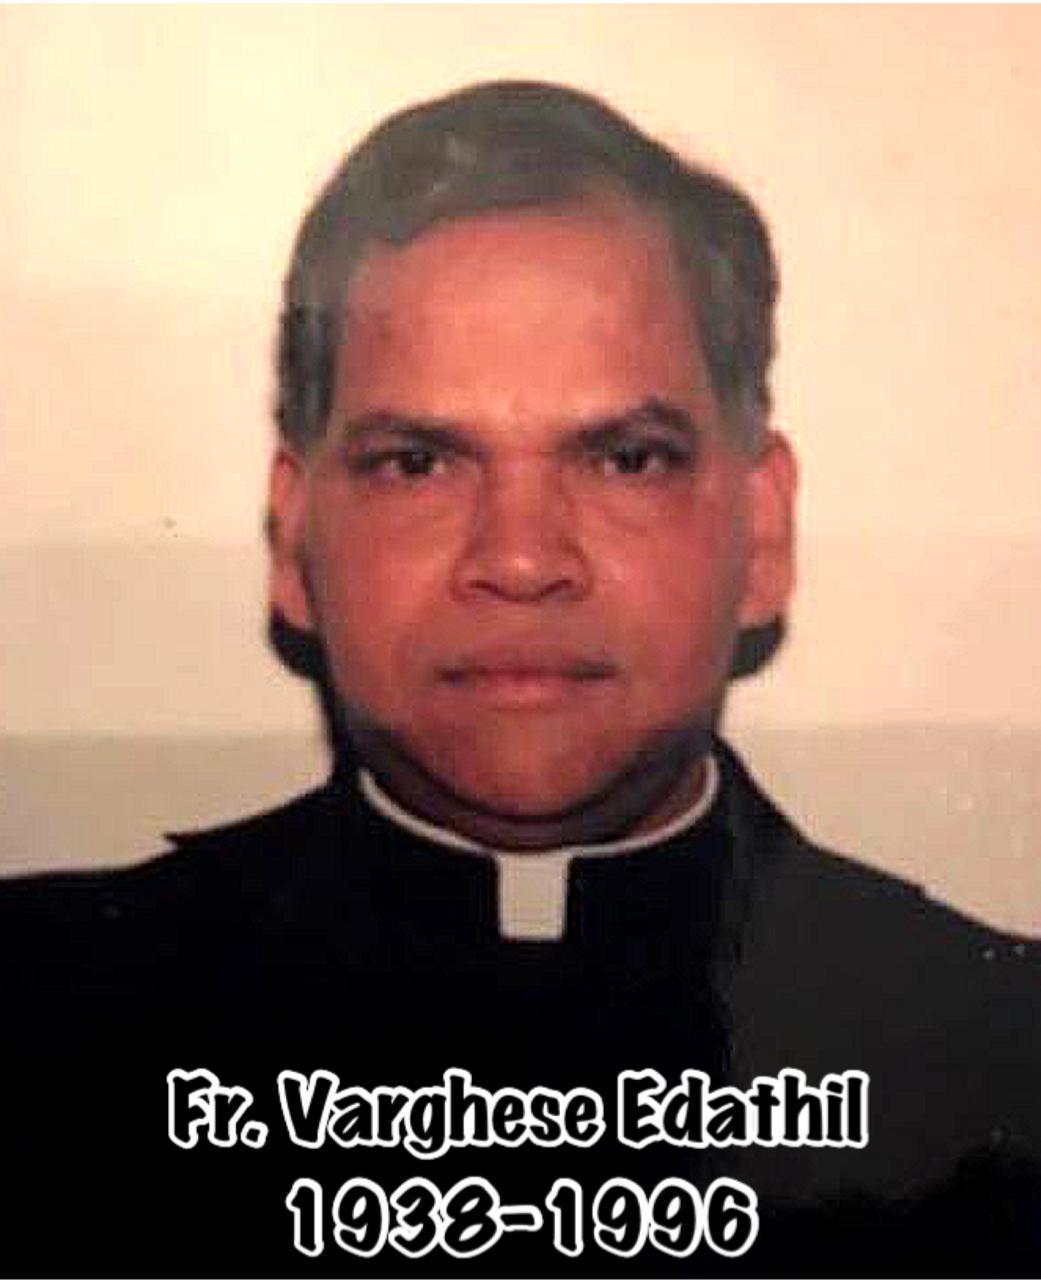 Fr Varghese Edathil 1938 - 1996